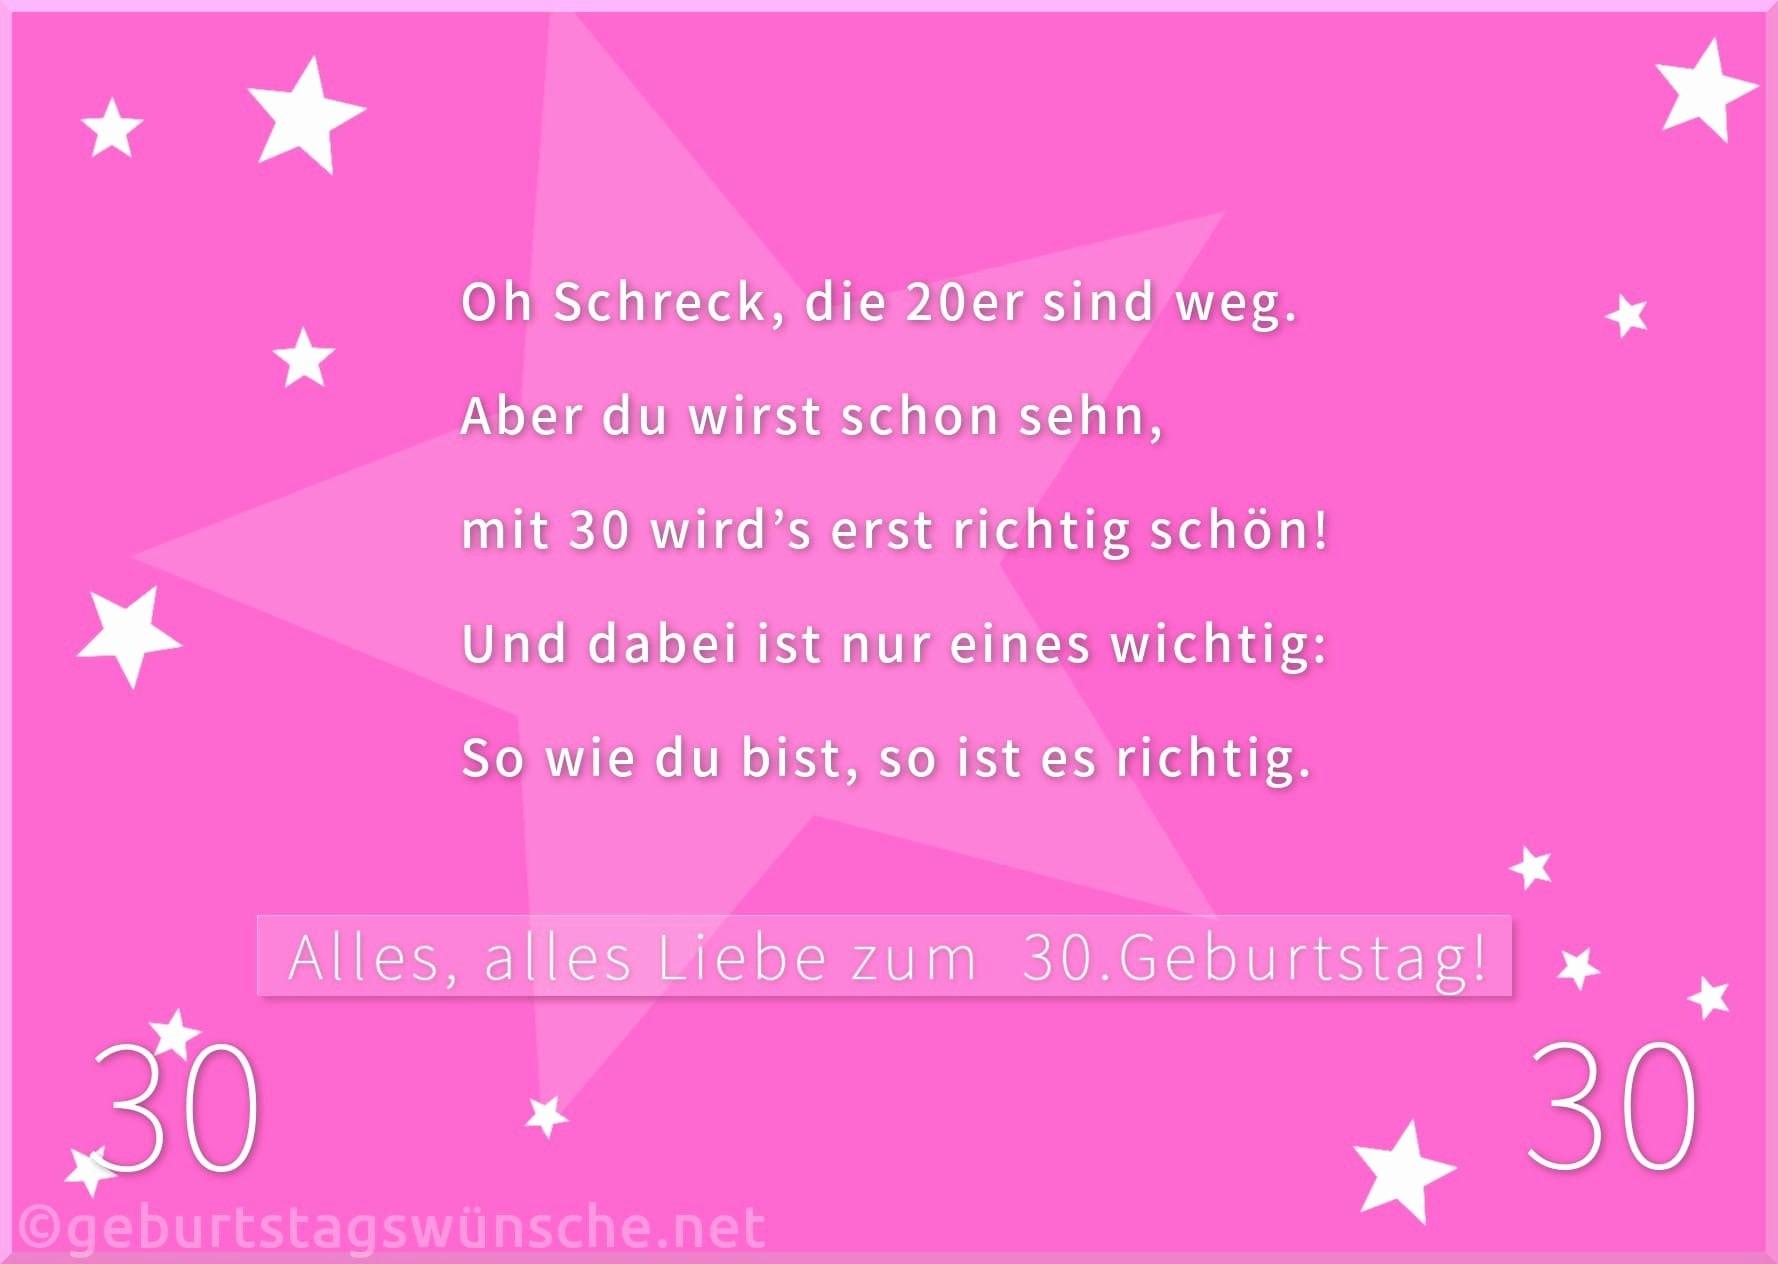 Geburtstagssprüche Freundin Kurz  Geburtstagswünsche Gute Freundin Kurz droitshumainsfo